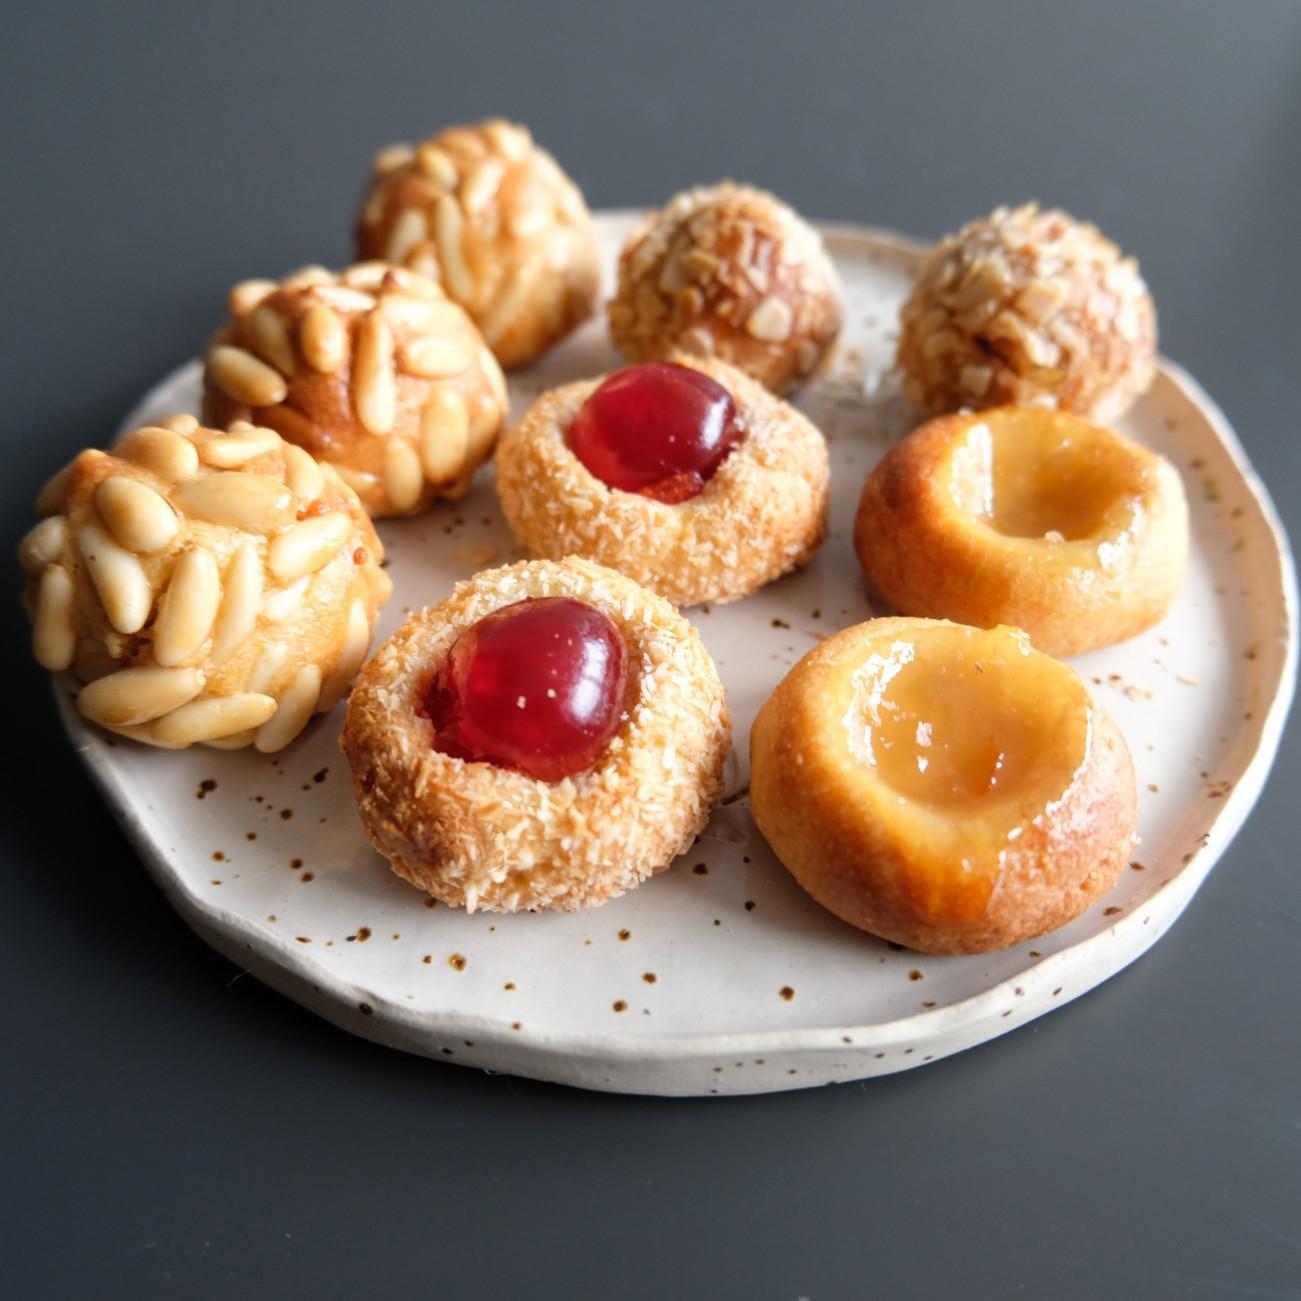 Panellets recipe, almond paste treats